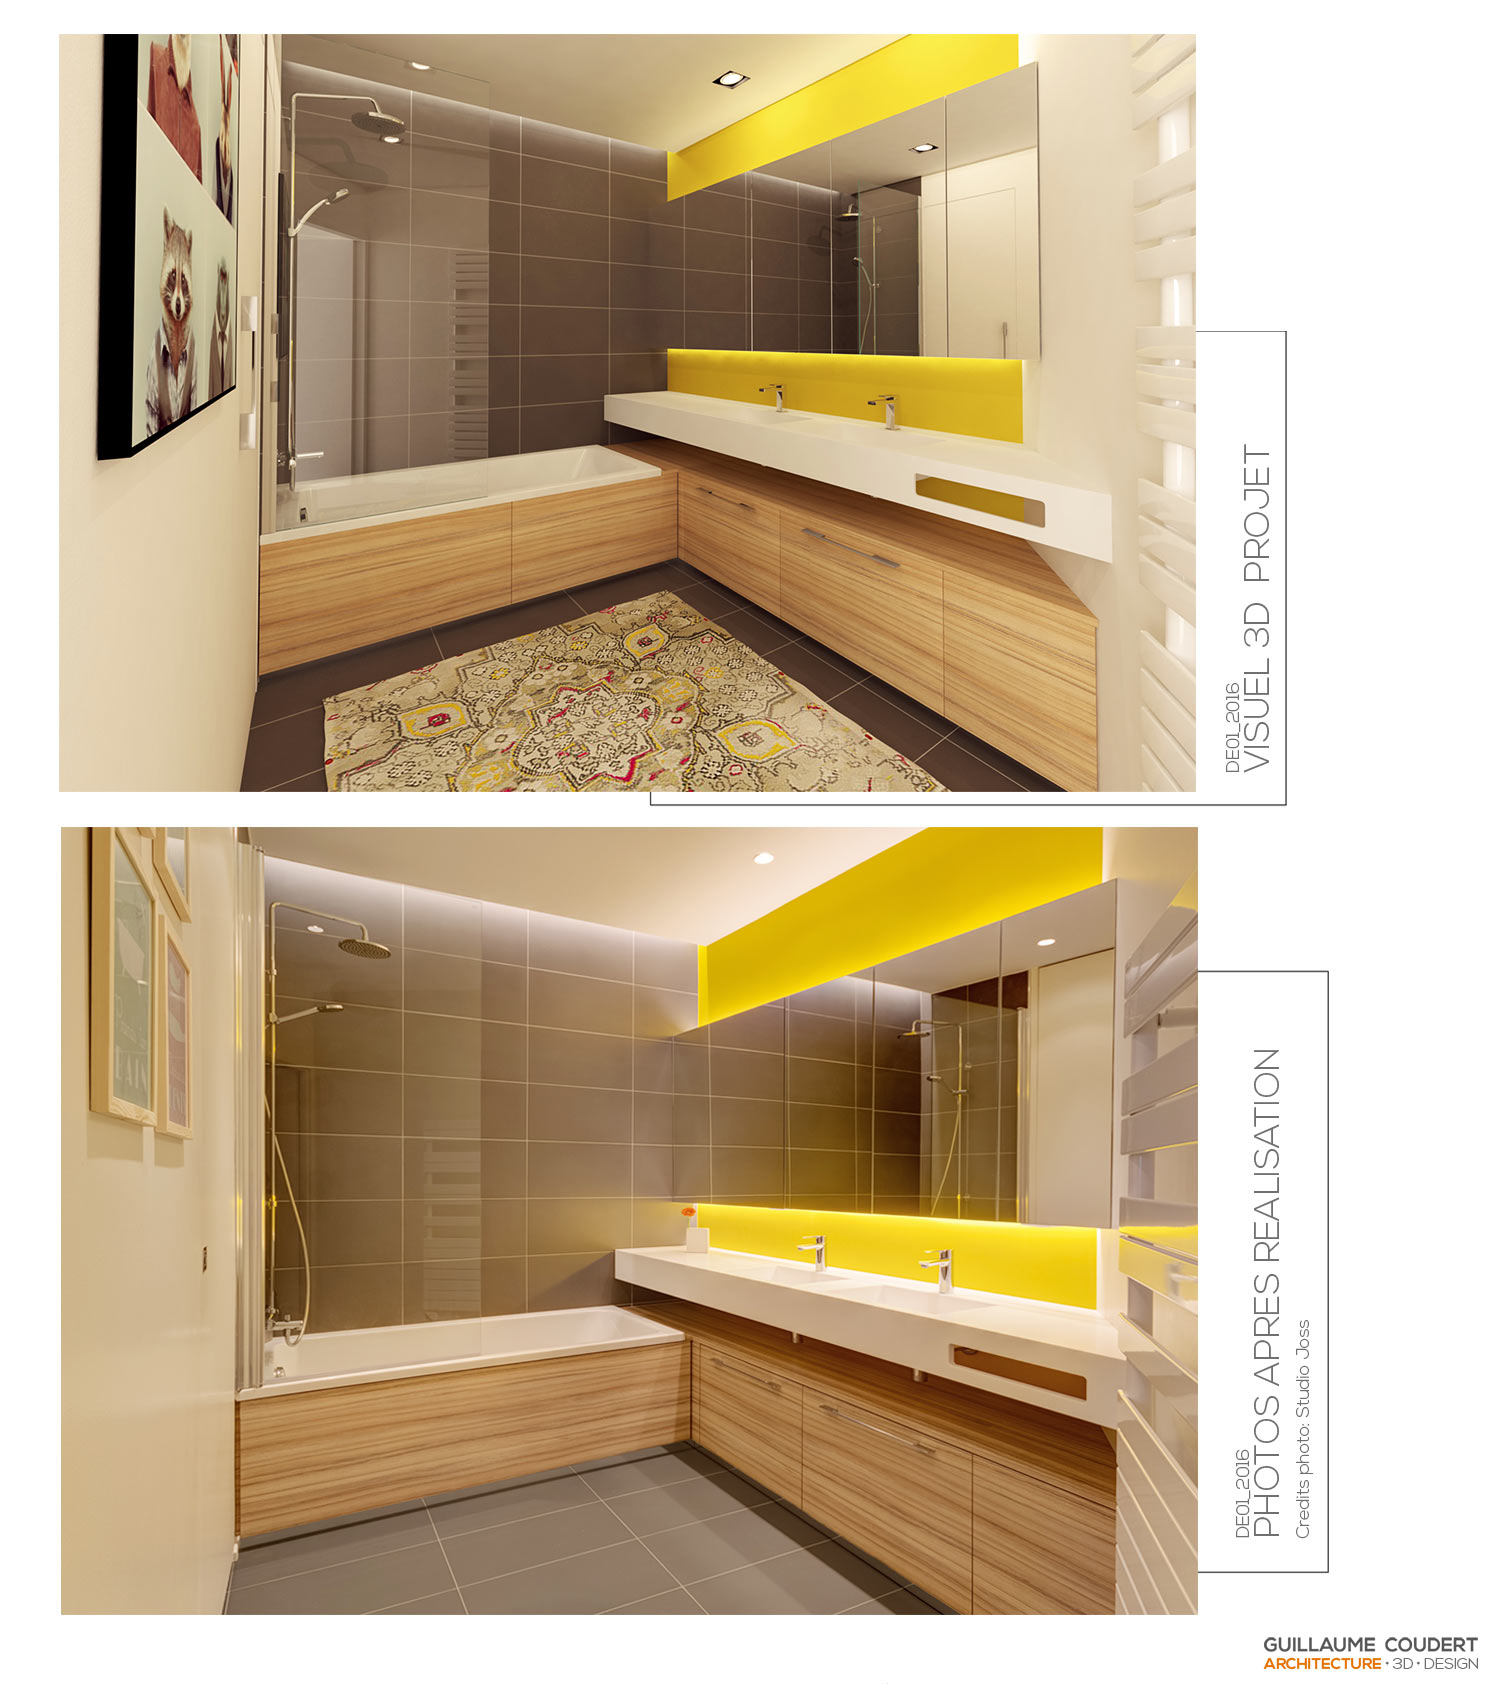 Projet salle de bain 3d simple rnovation salle de bain for Projet salle de bain 3d